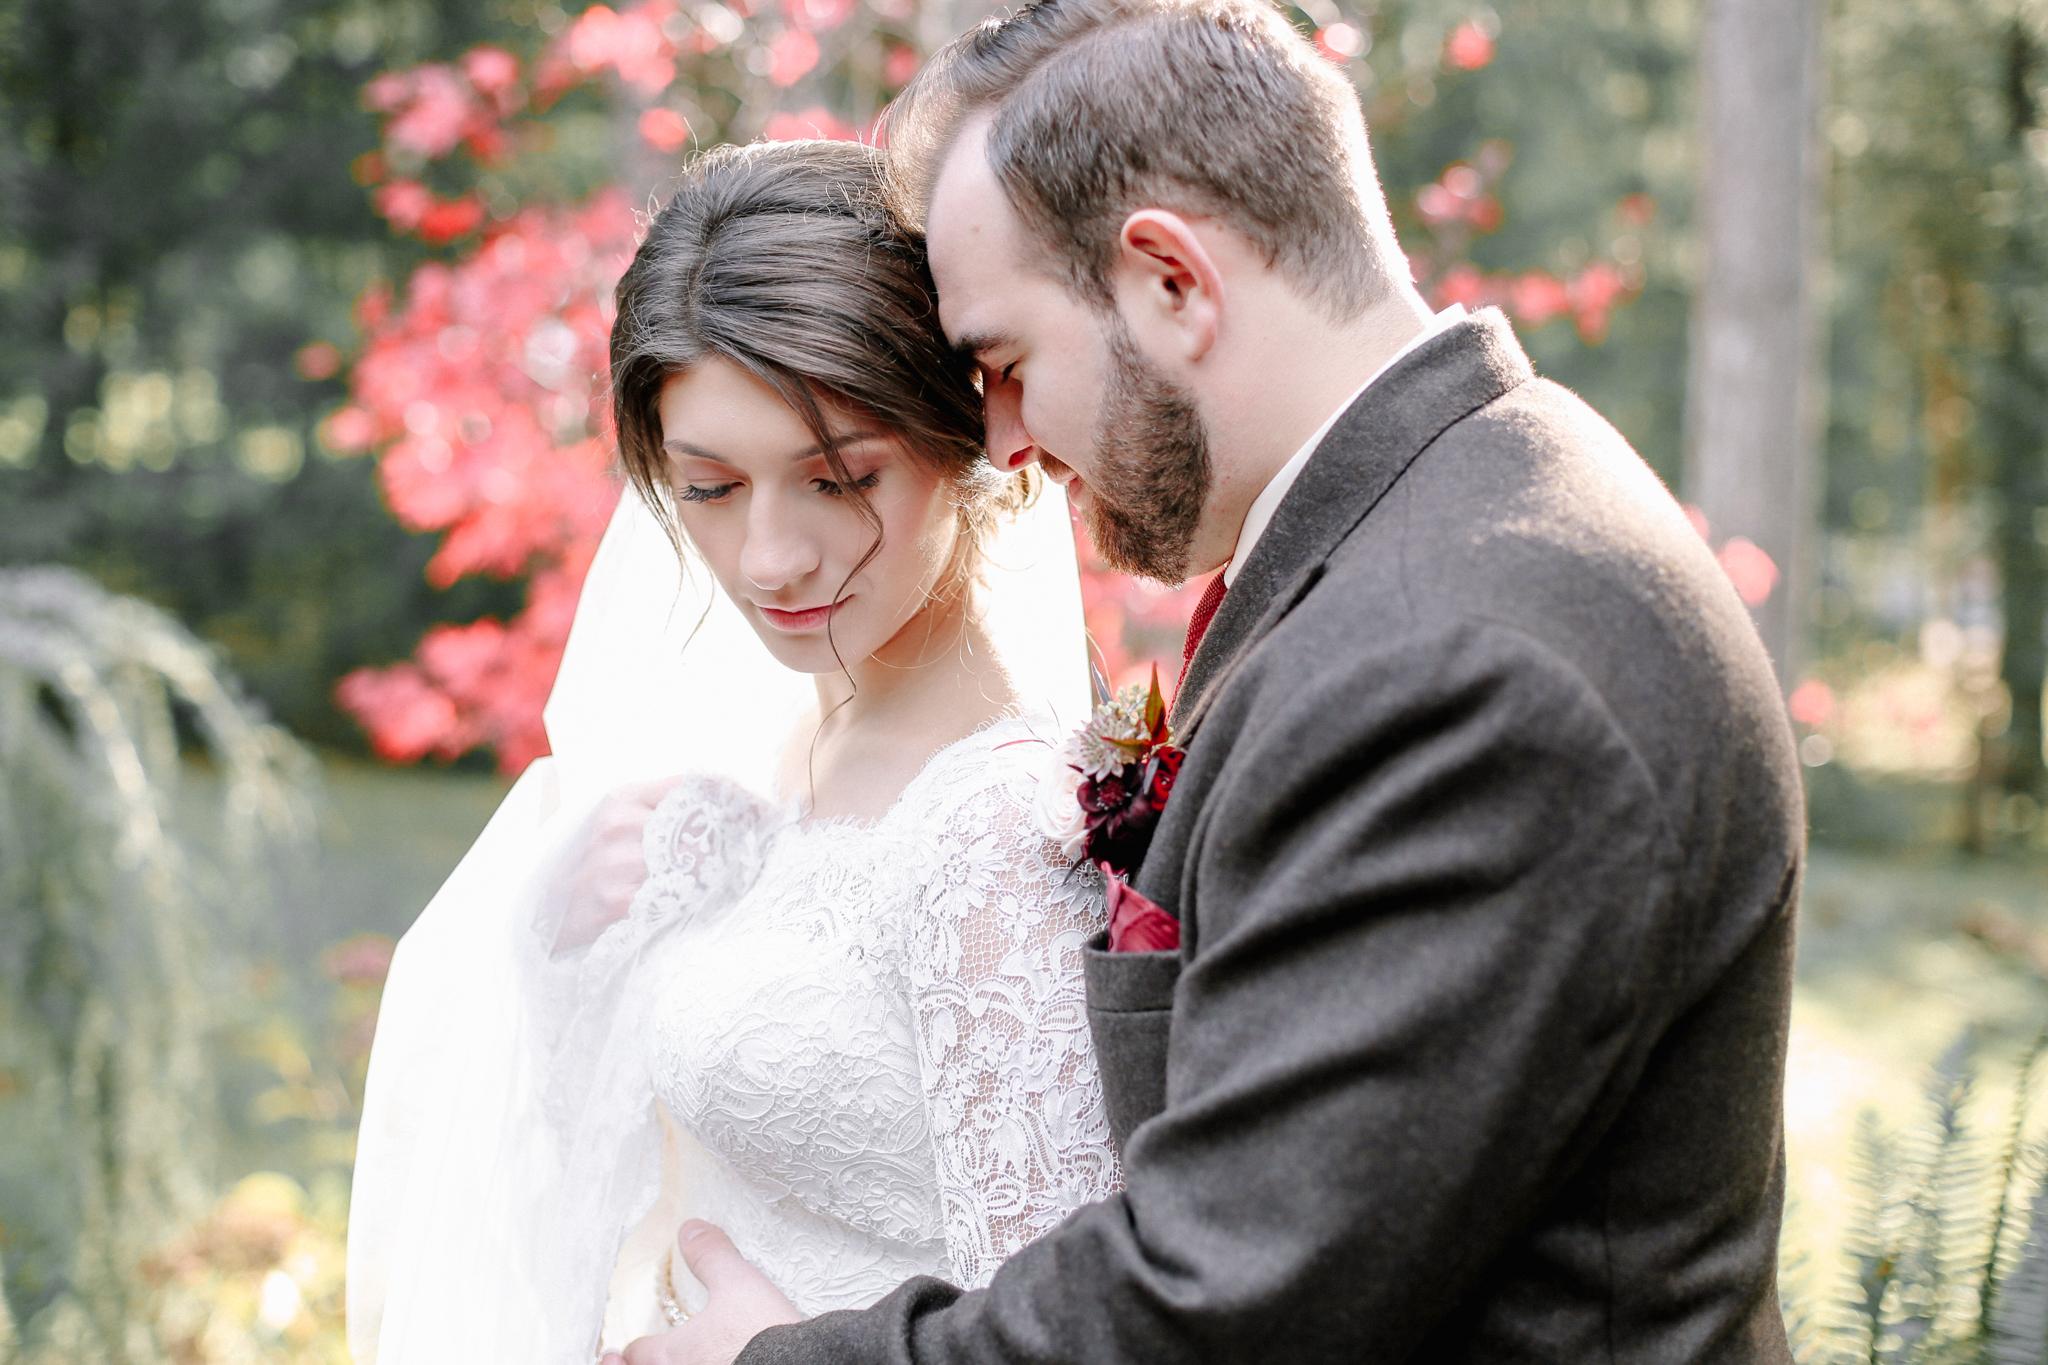 Manu and Laura - Portland Wedding Photographer - 39.jpg